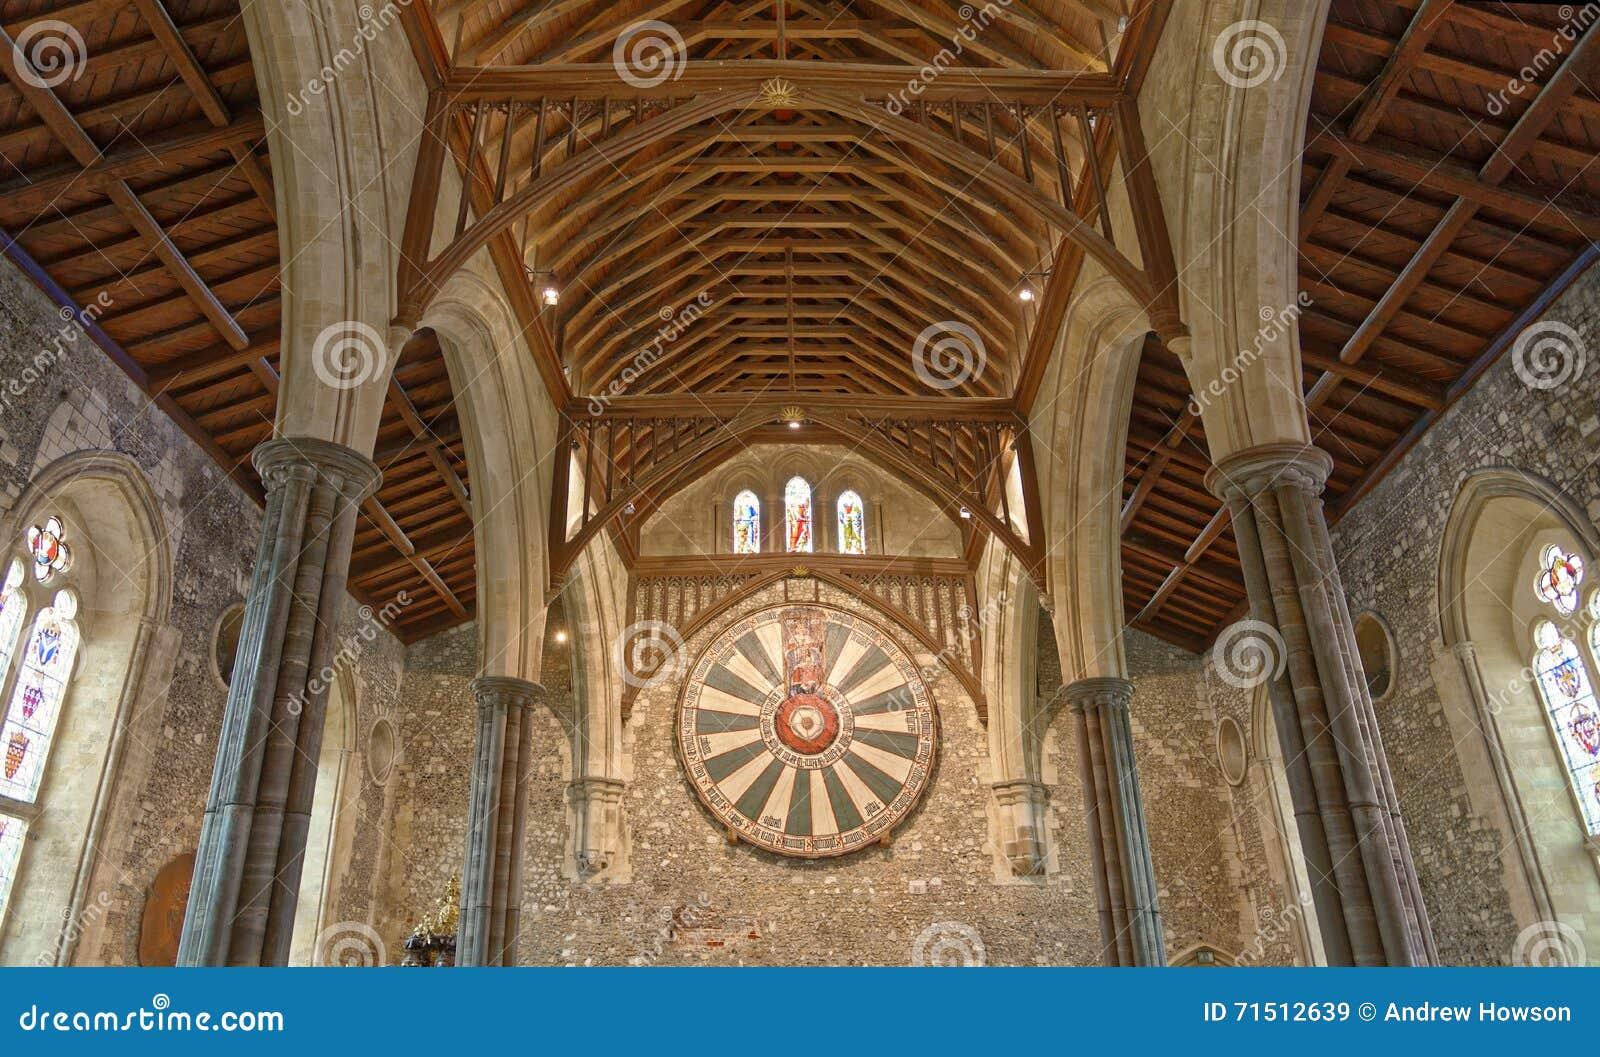 Le grand hall du château de Winchester au Hampshire, Angleterre